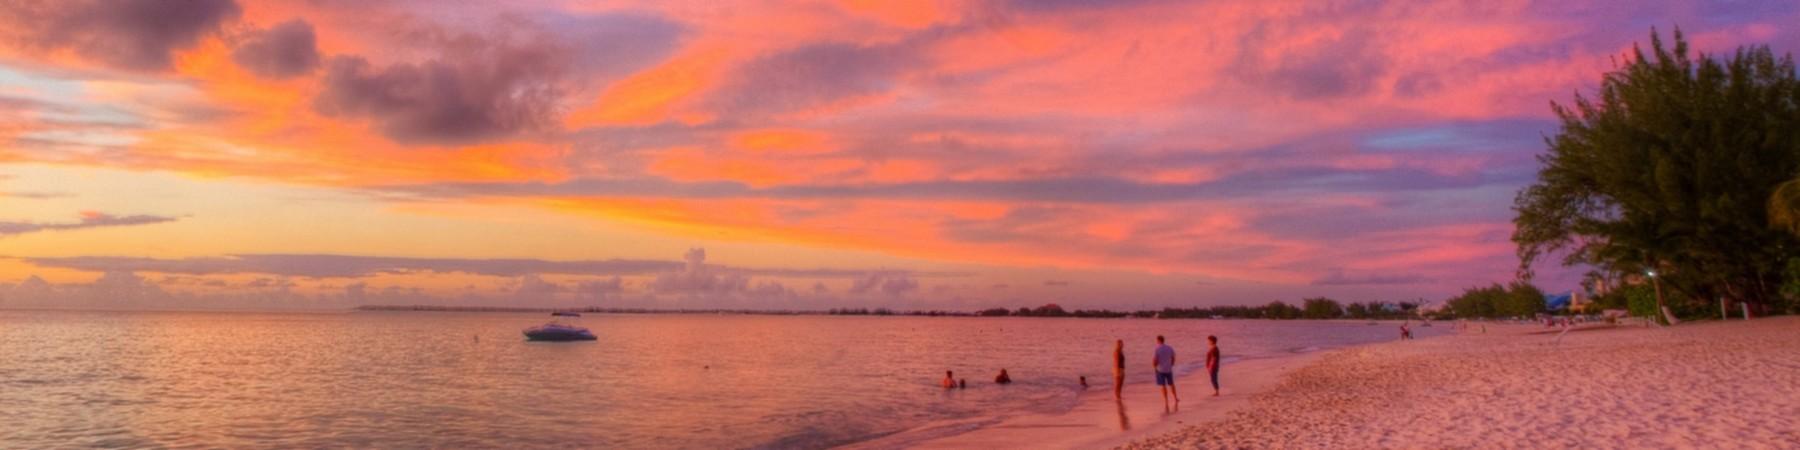 Cayman Islands Wikitravel